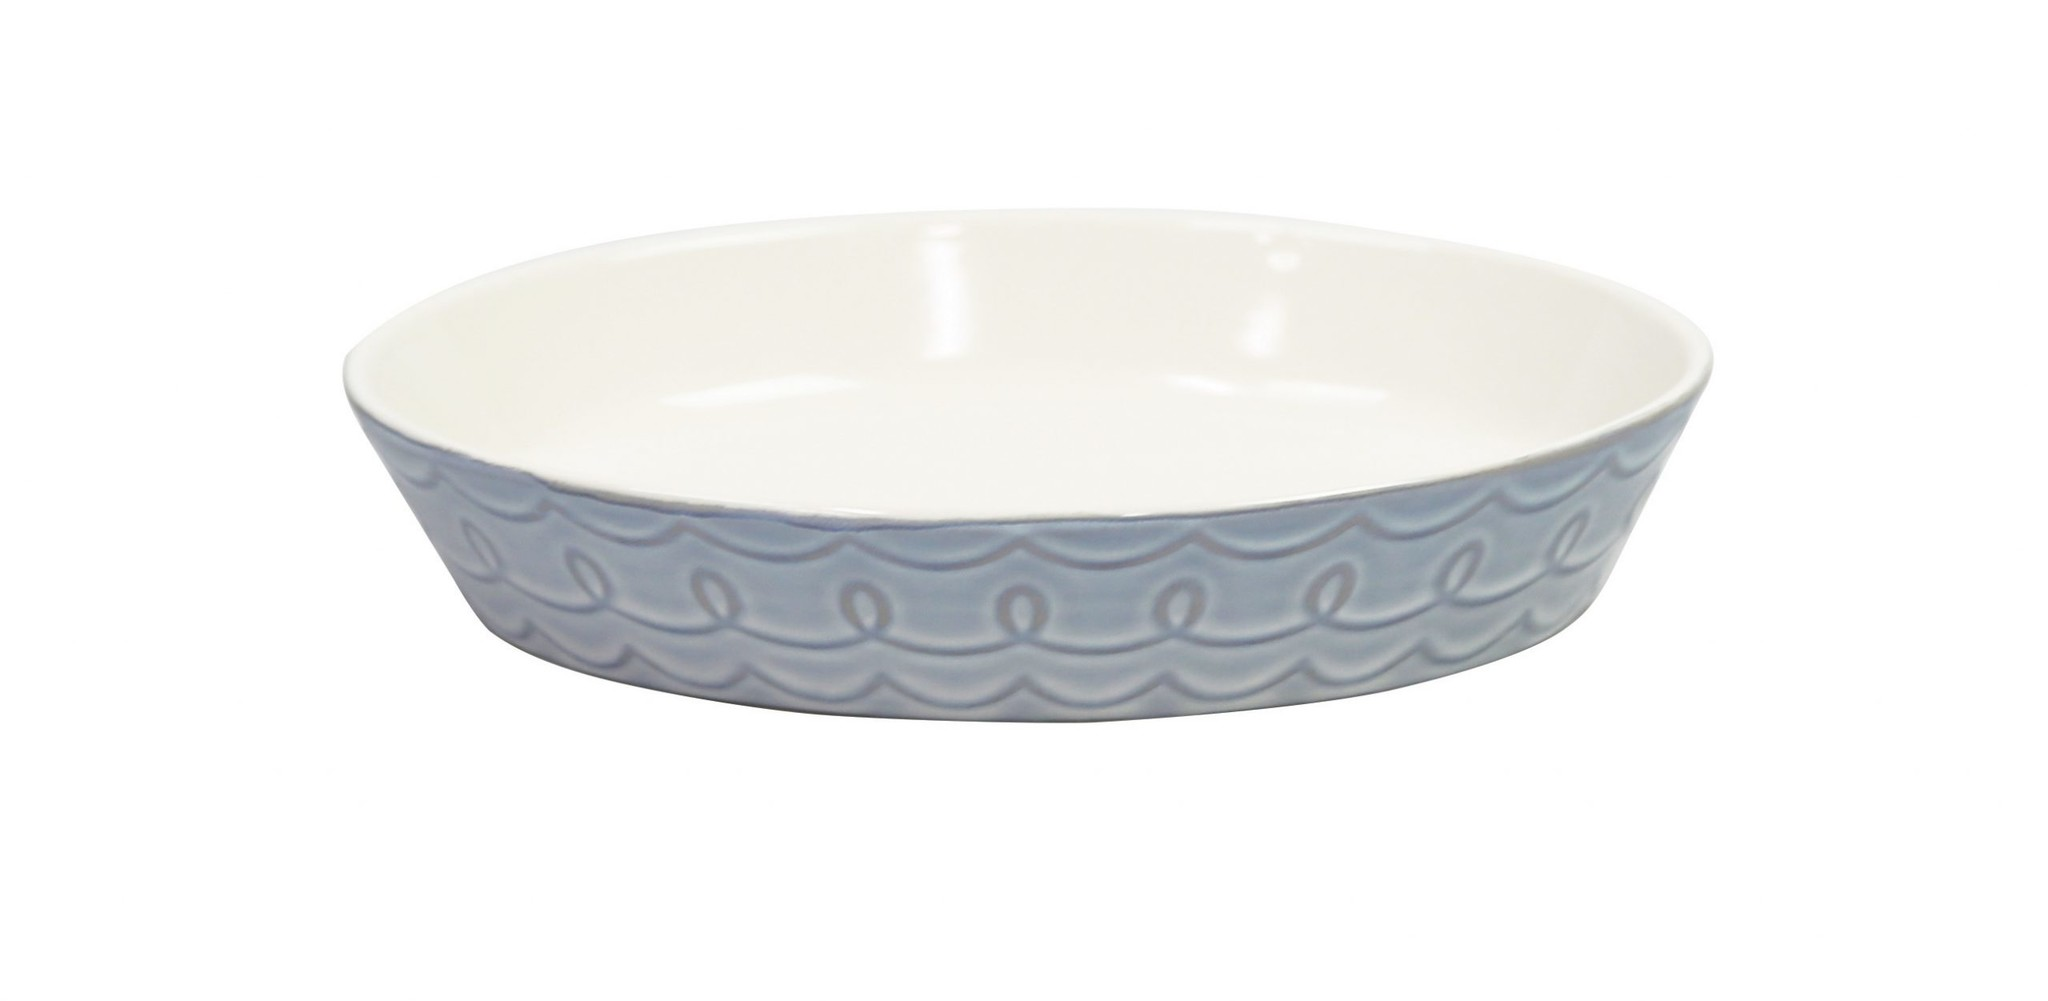 Pioneer Pet Products Pioneer Pet Ceramic Dish Oval Loops